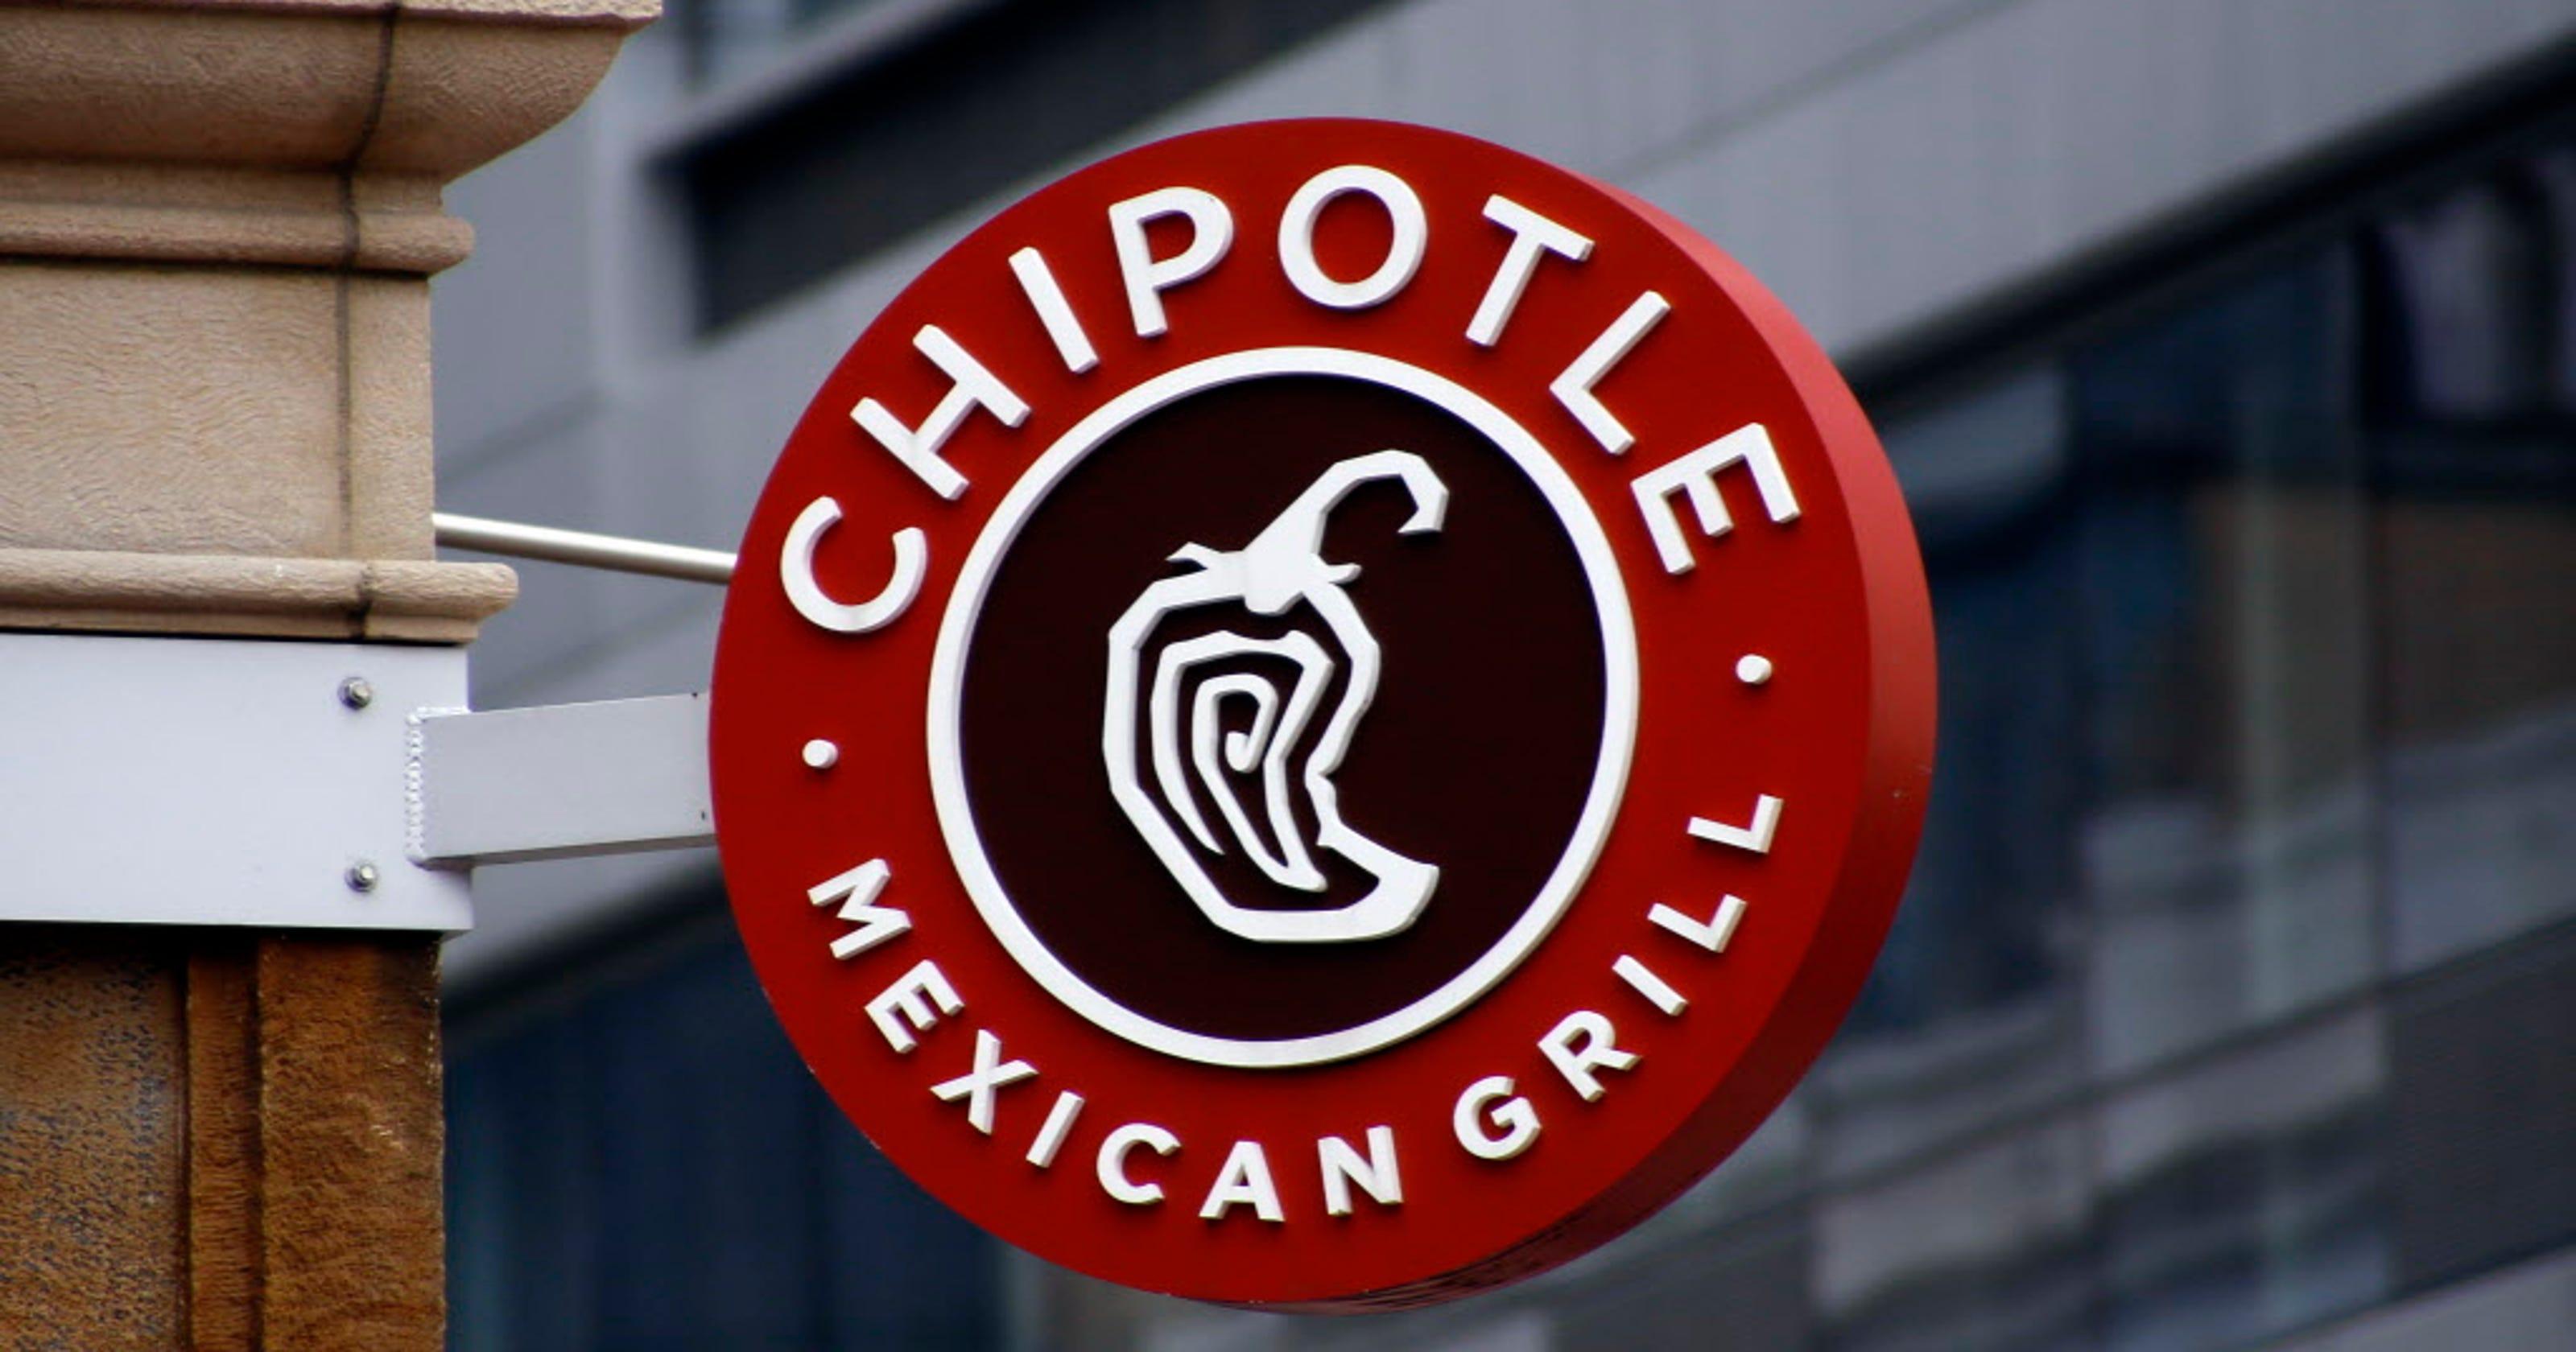 10 Restaurants Turn Chipotle Into Roadkill